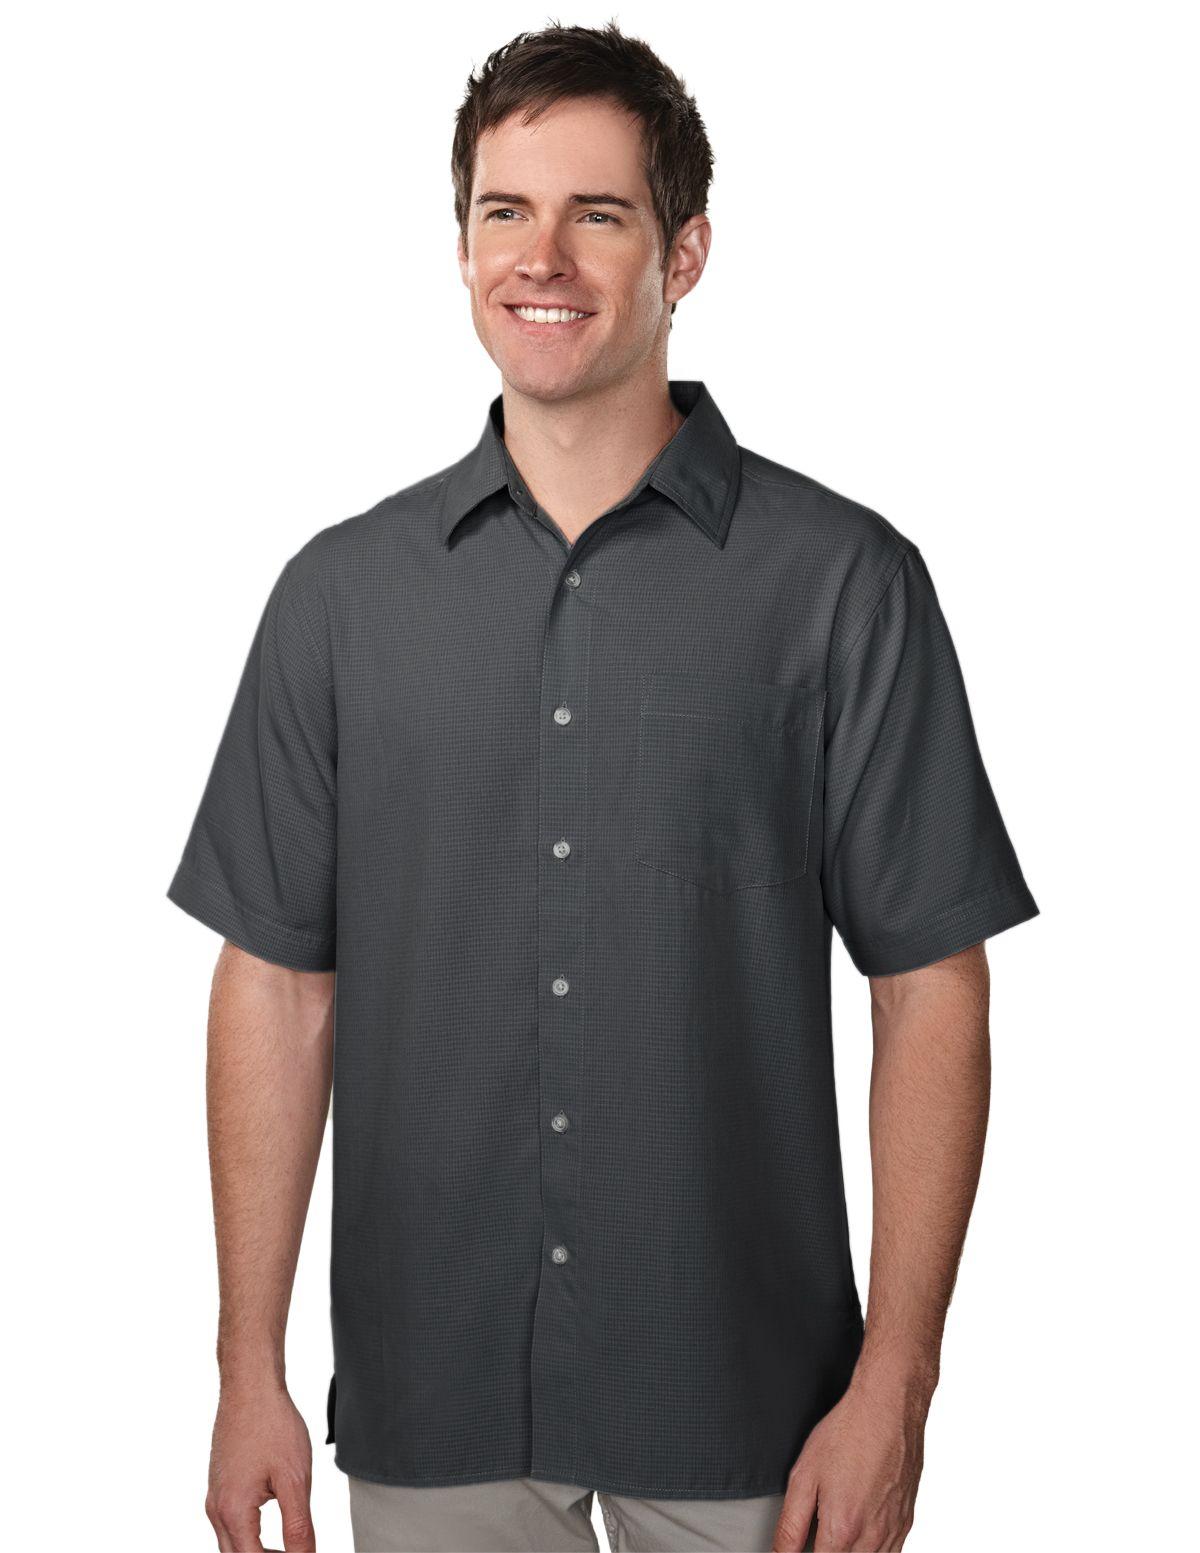 Tri-Mountain Men/'s Button Down Collar Short Sleeve Shooting Dress Shirt 786